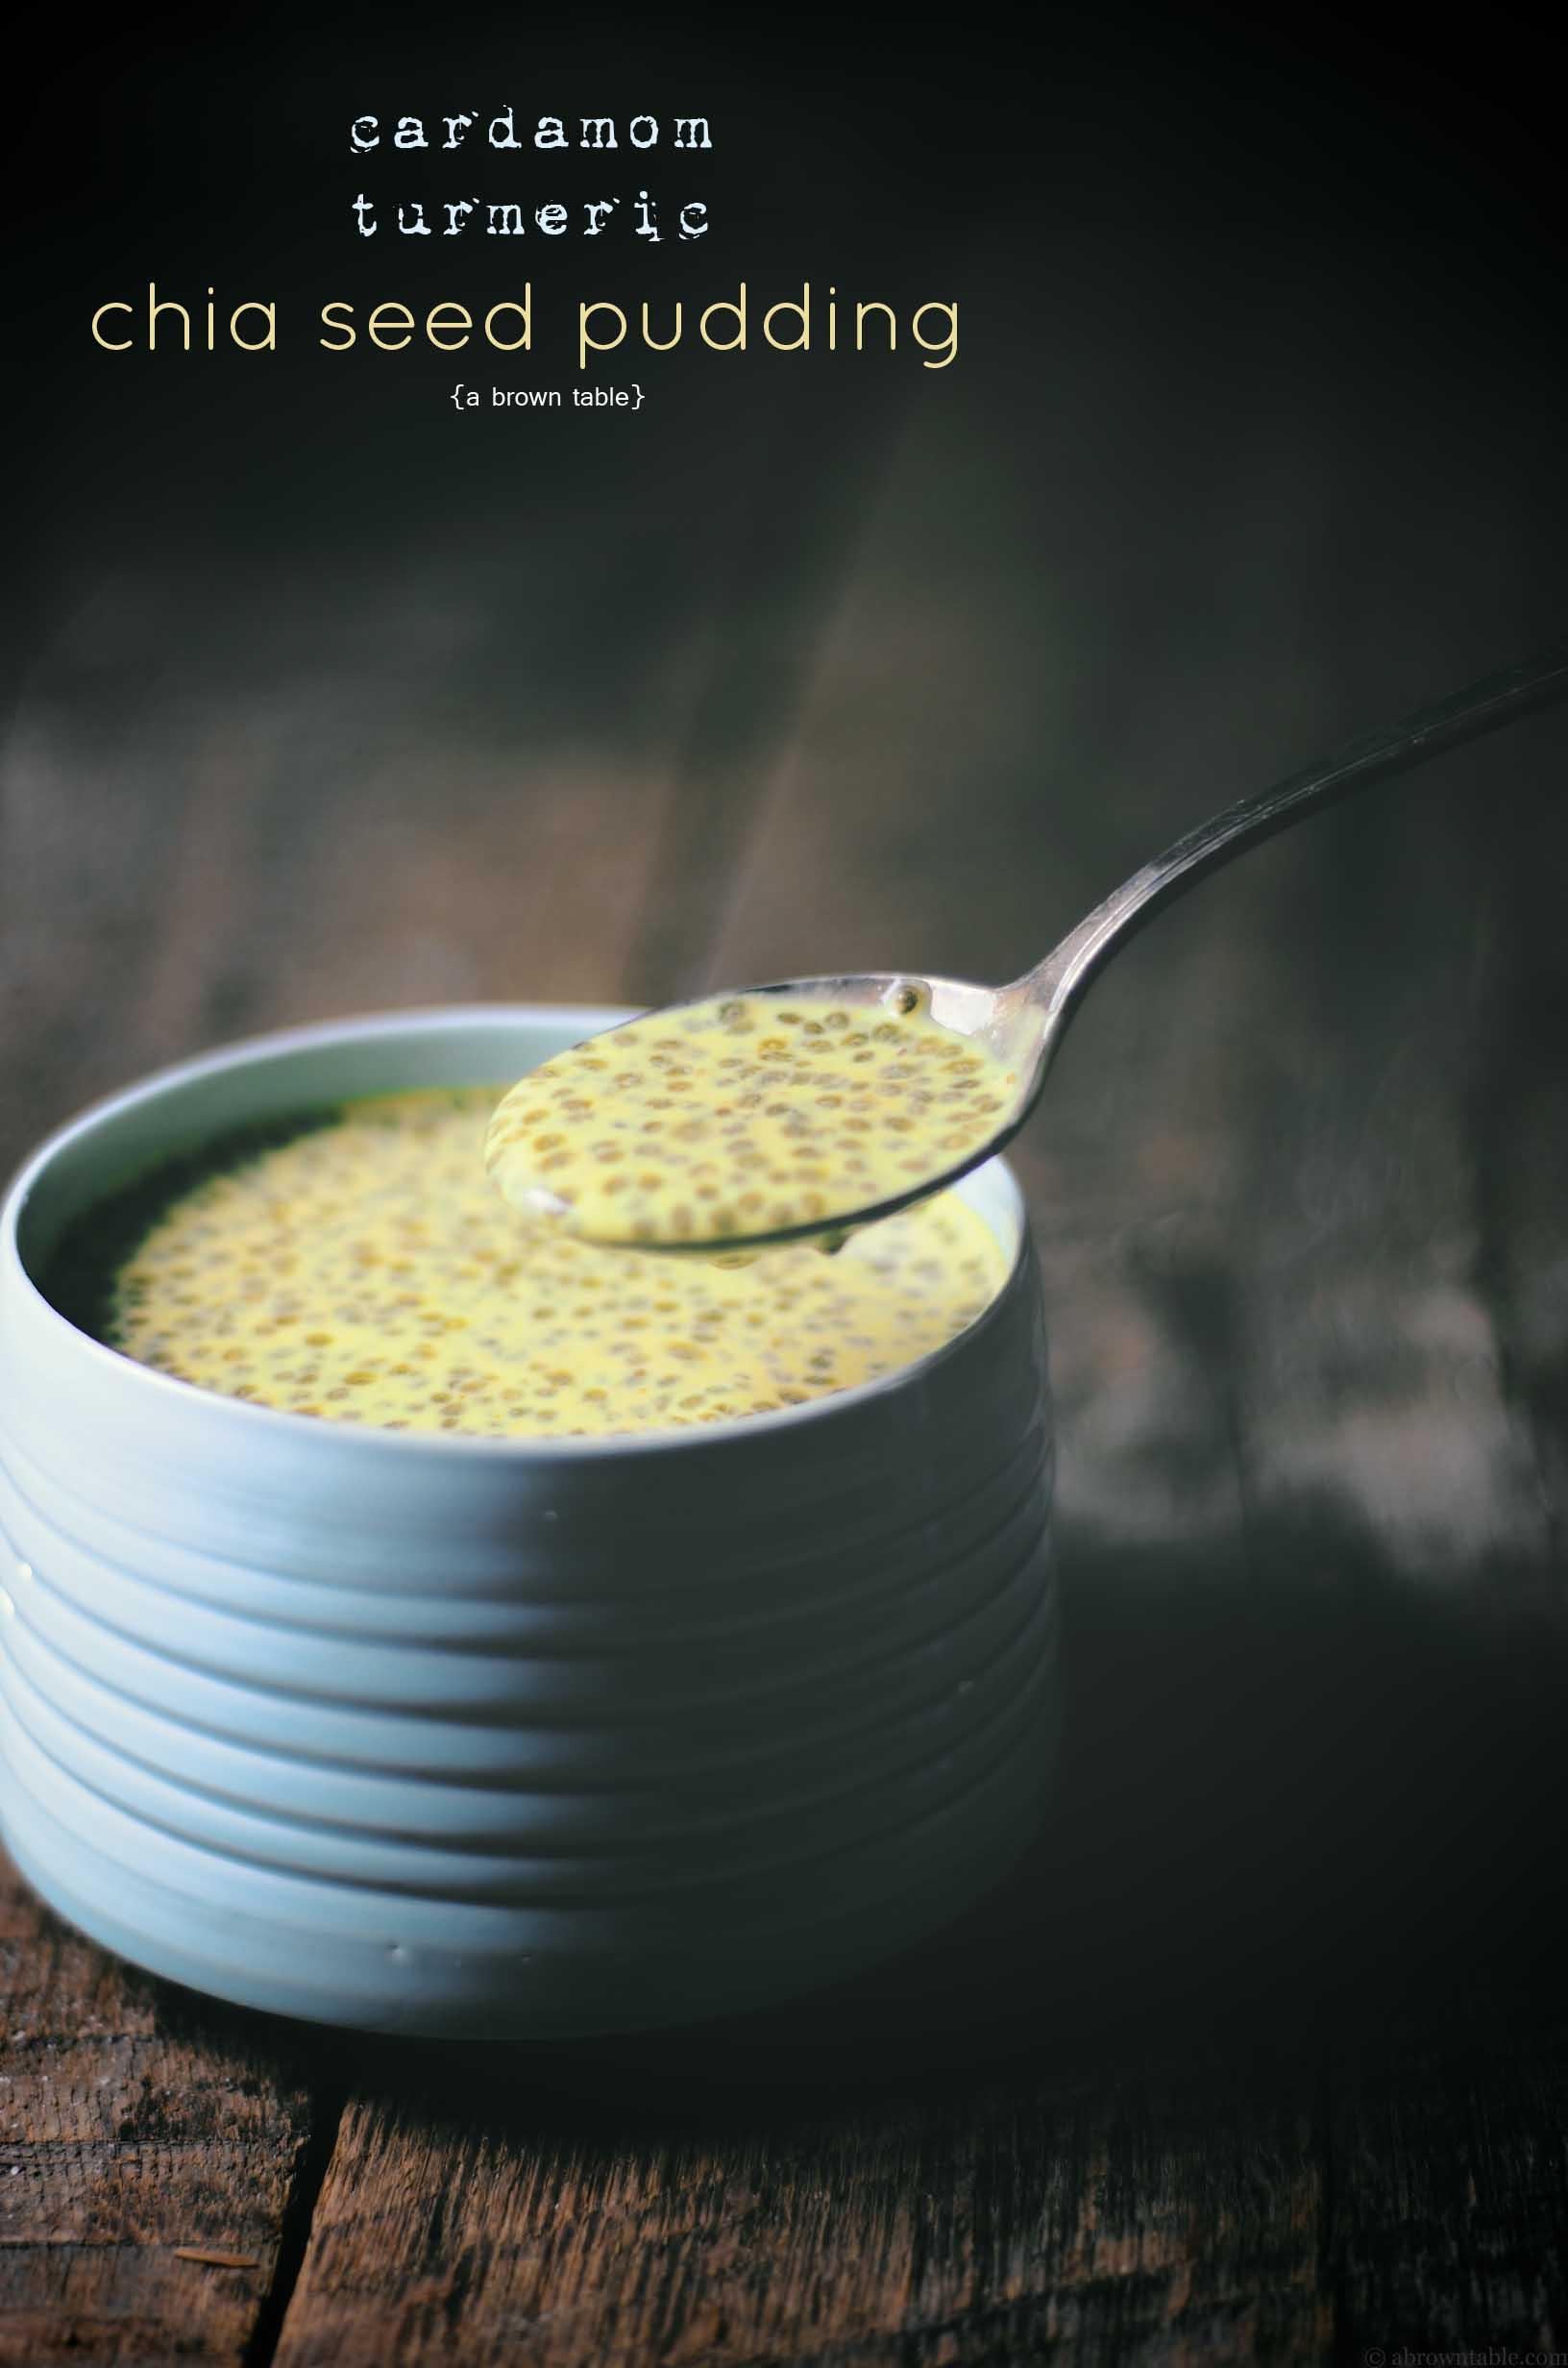 vegan cardamom turmeric chia seed pudding